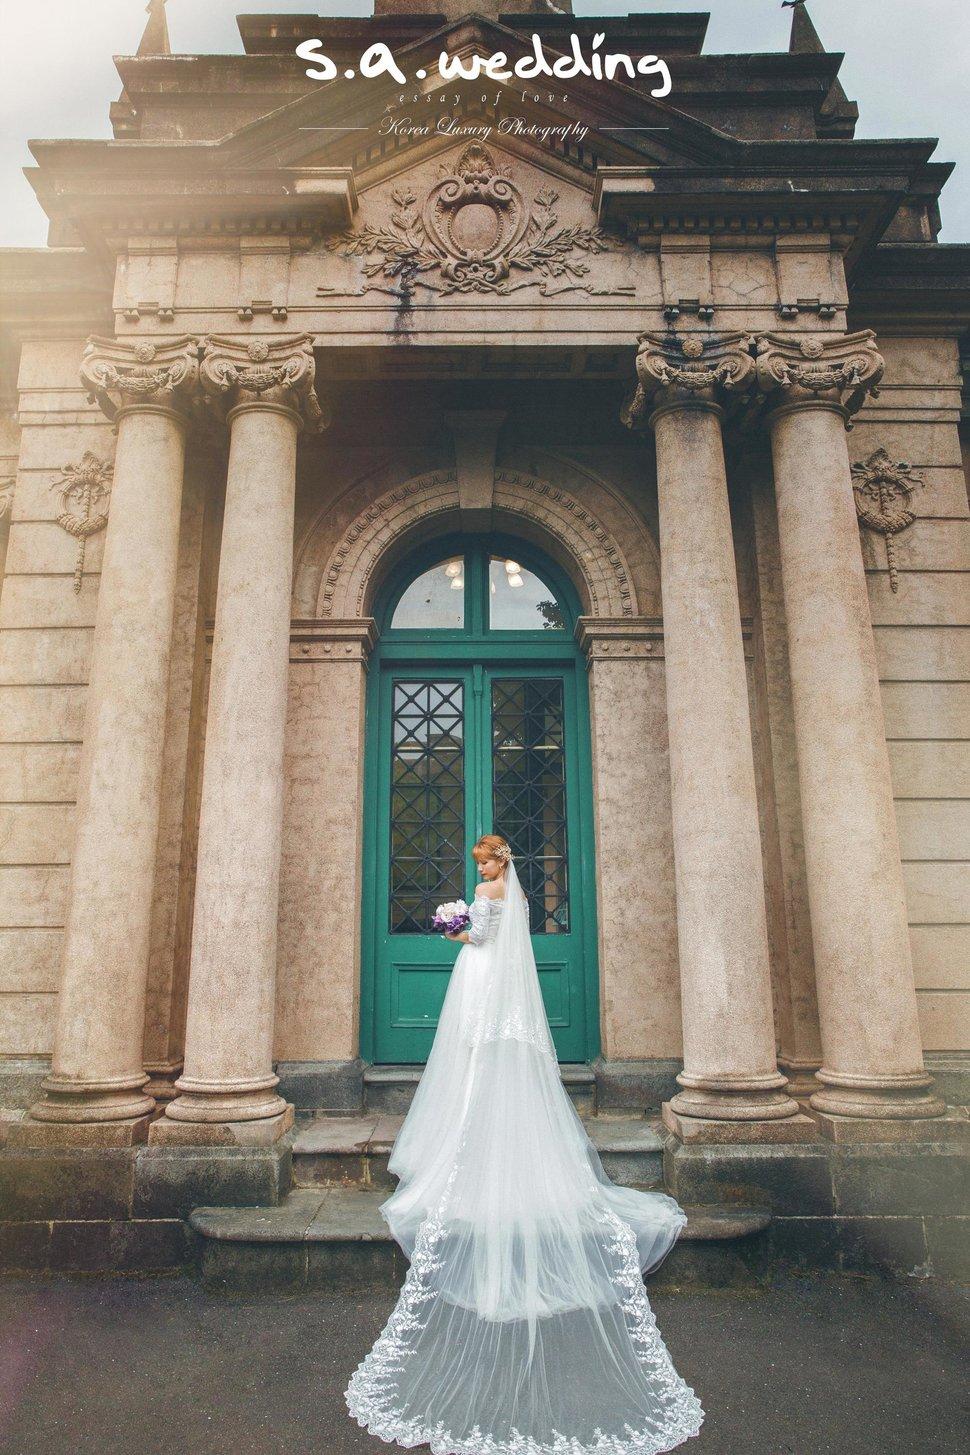 NSH_2255_ps (Copy) - s.a. wedding 韓國婚紗攝影《結婚吧》